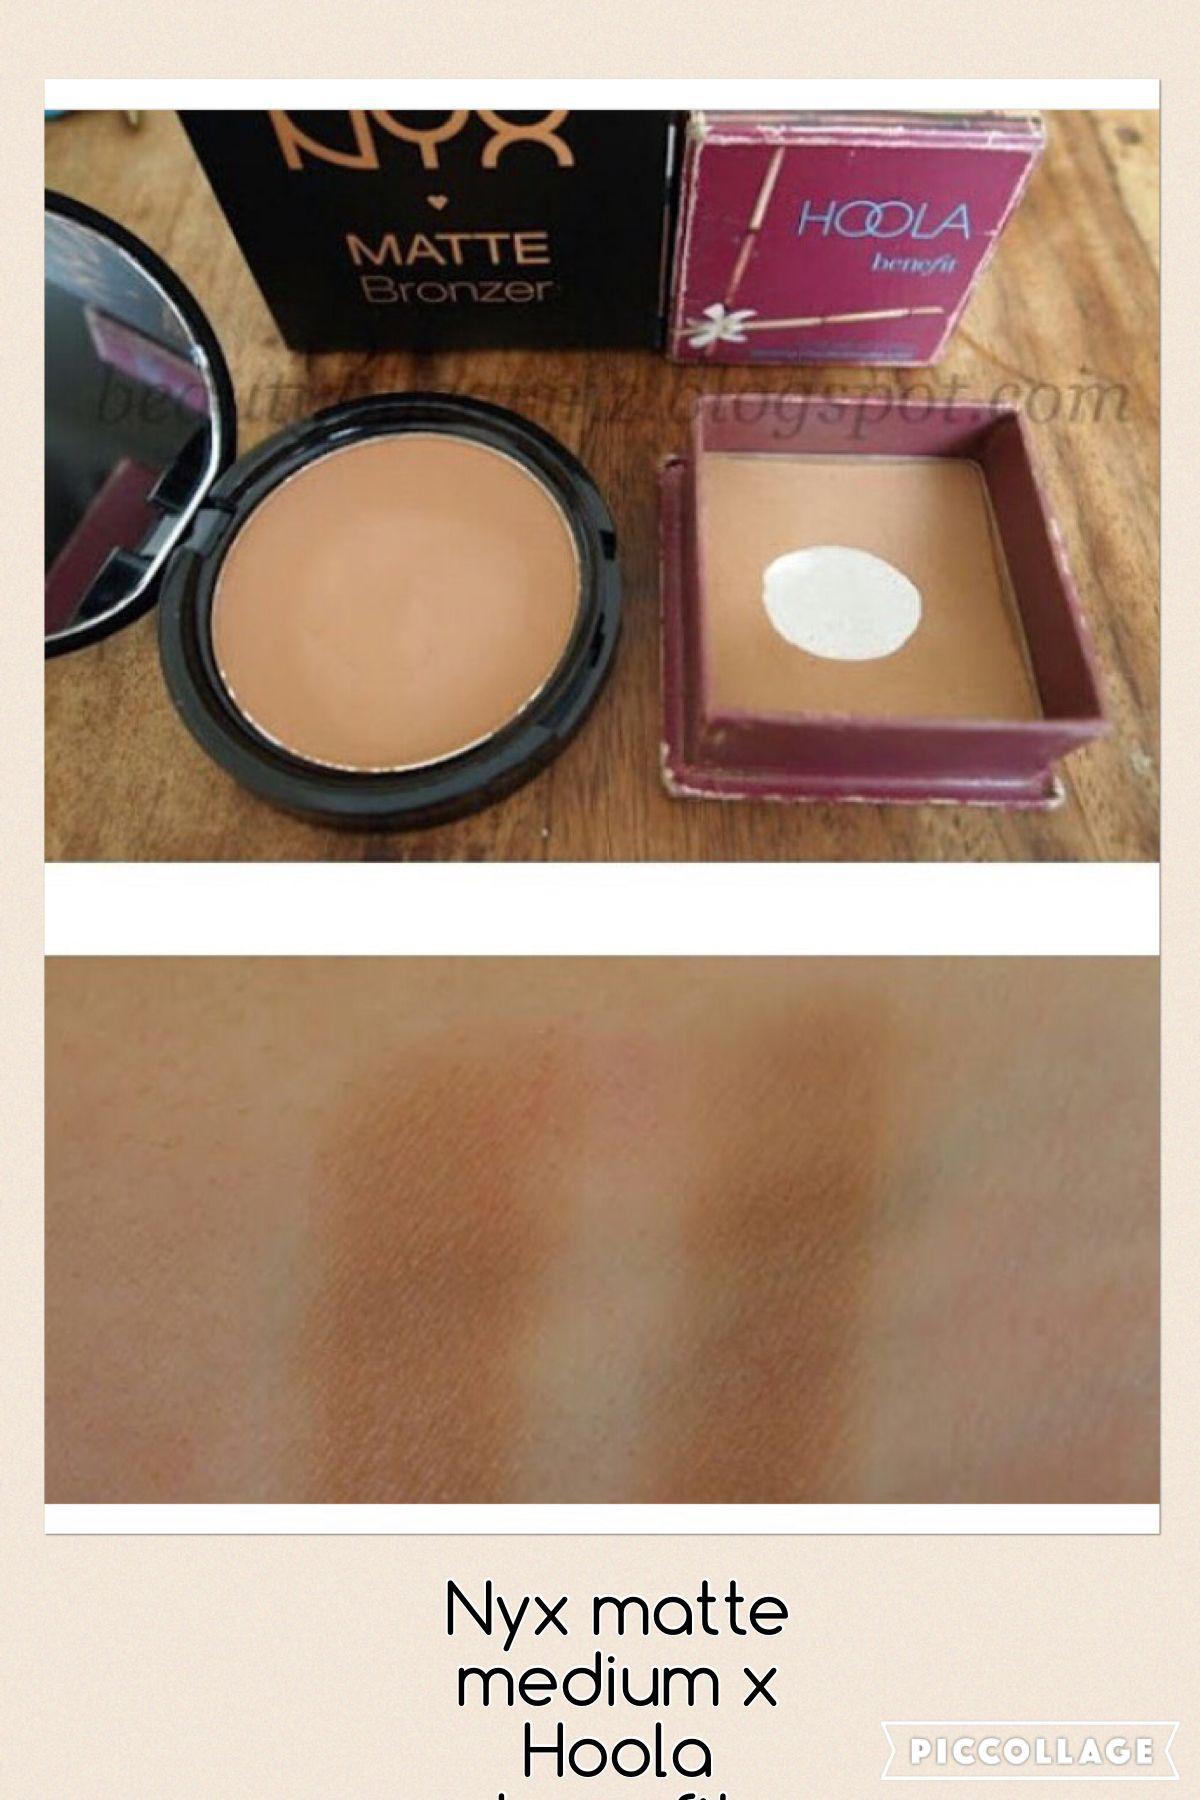 7feb99800eb Nyx Matte Bronzer Medium dupe Hoola Benefit Hoola Bronzer Dupe, Drugstore  Bronzer, Bronzer Makeup